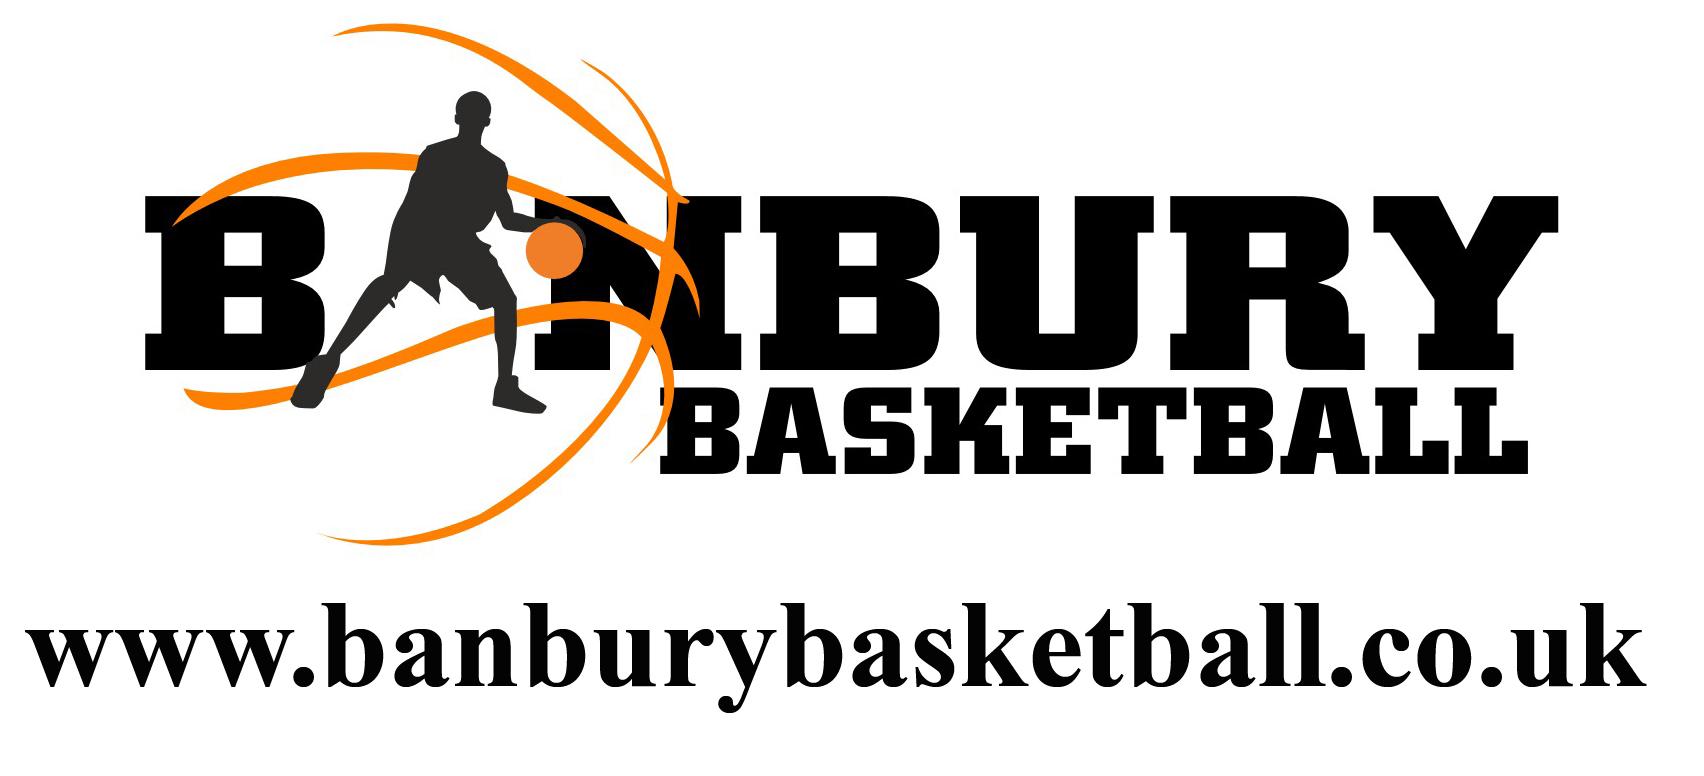 Banbury Basketball